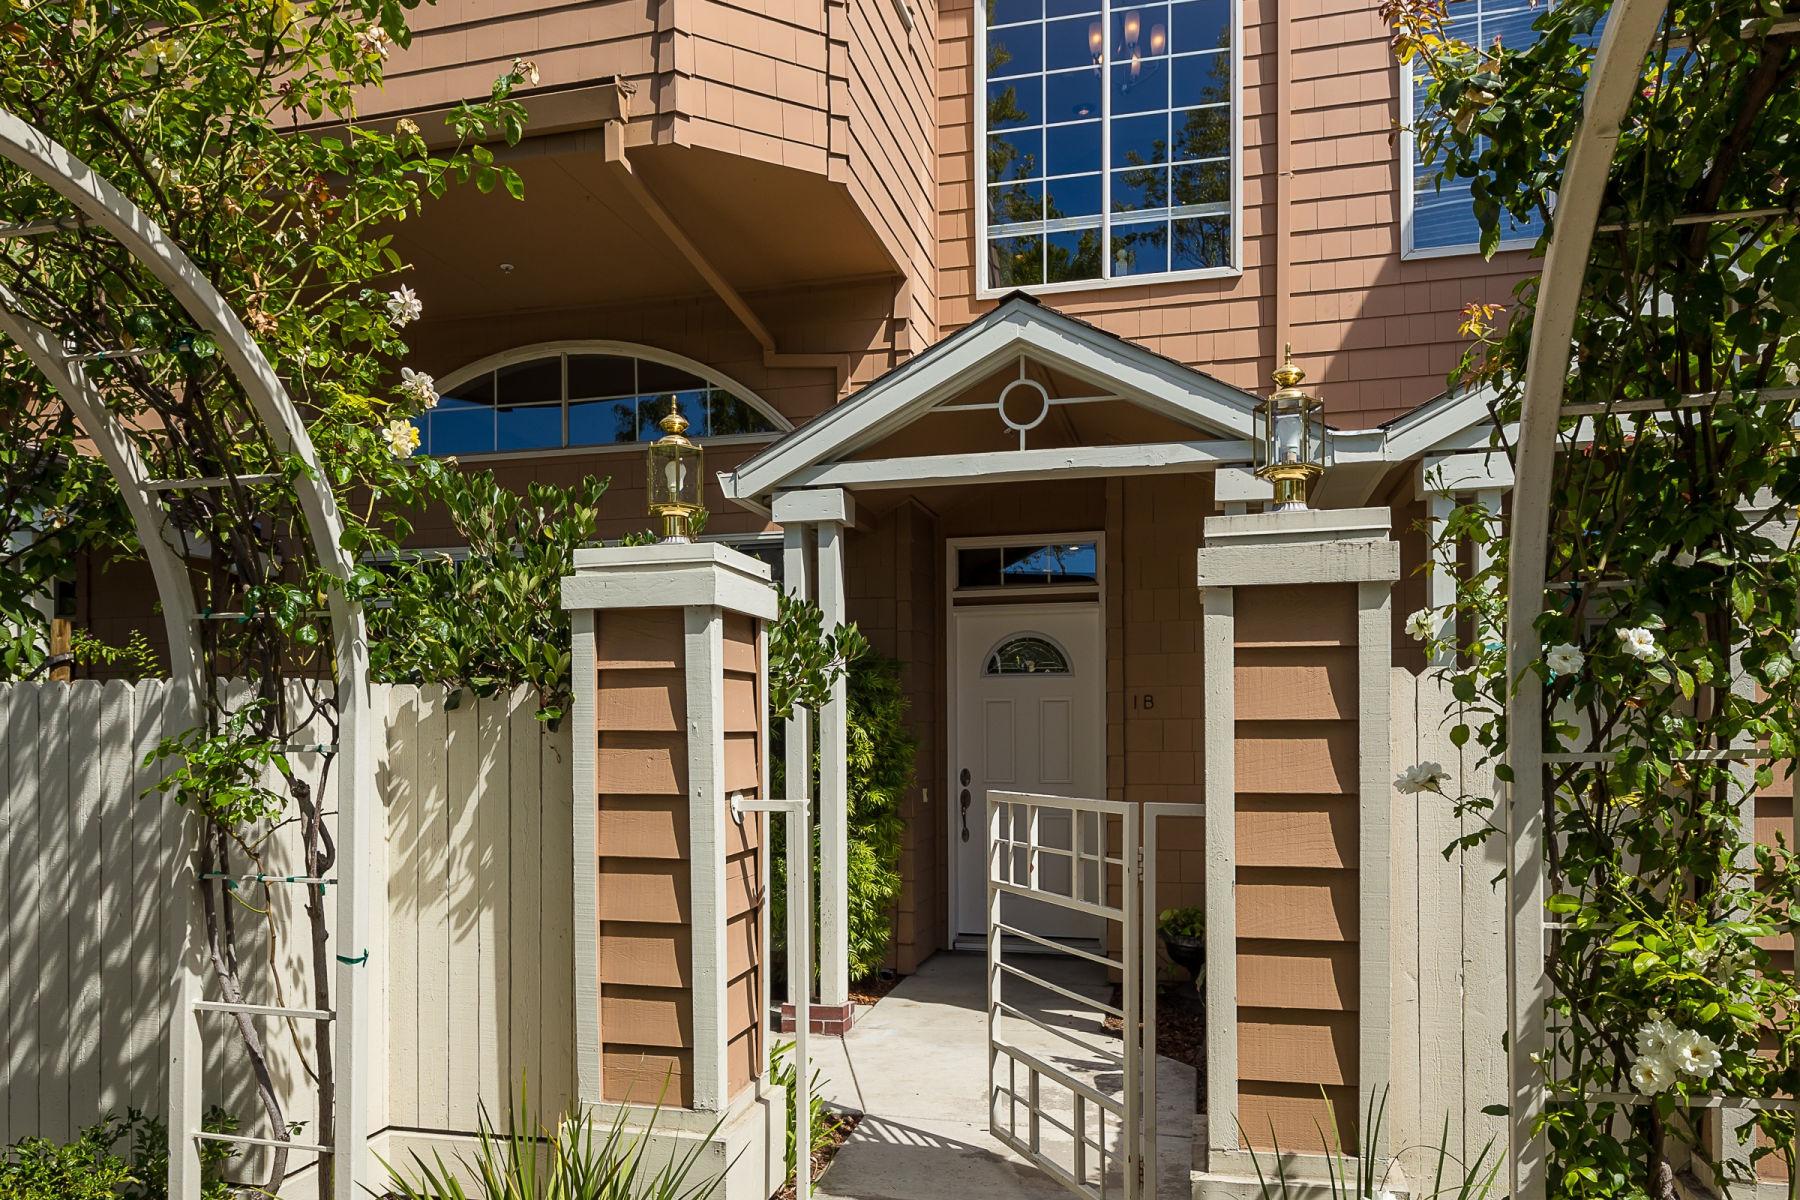 Single Family Home for Sale at San Antonio #1B 444 San Antonio #1B Palo Alto, California 94306 United States